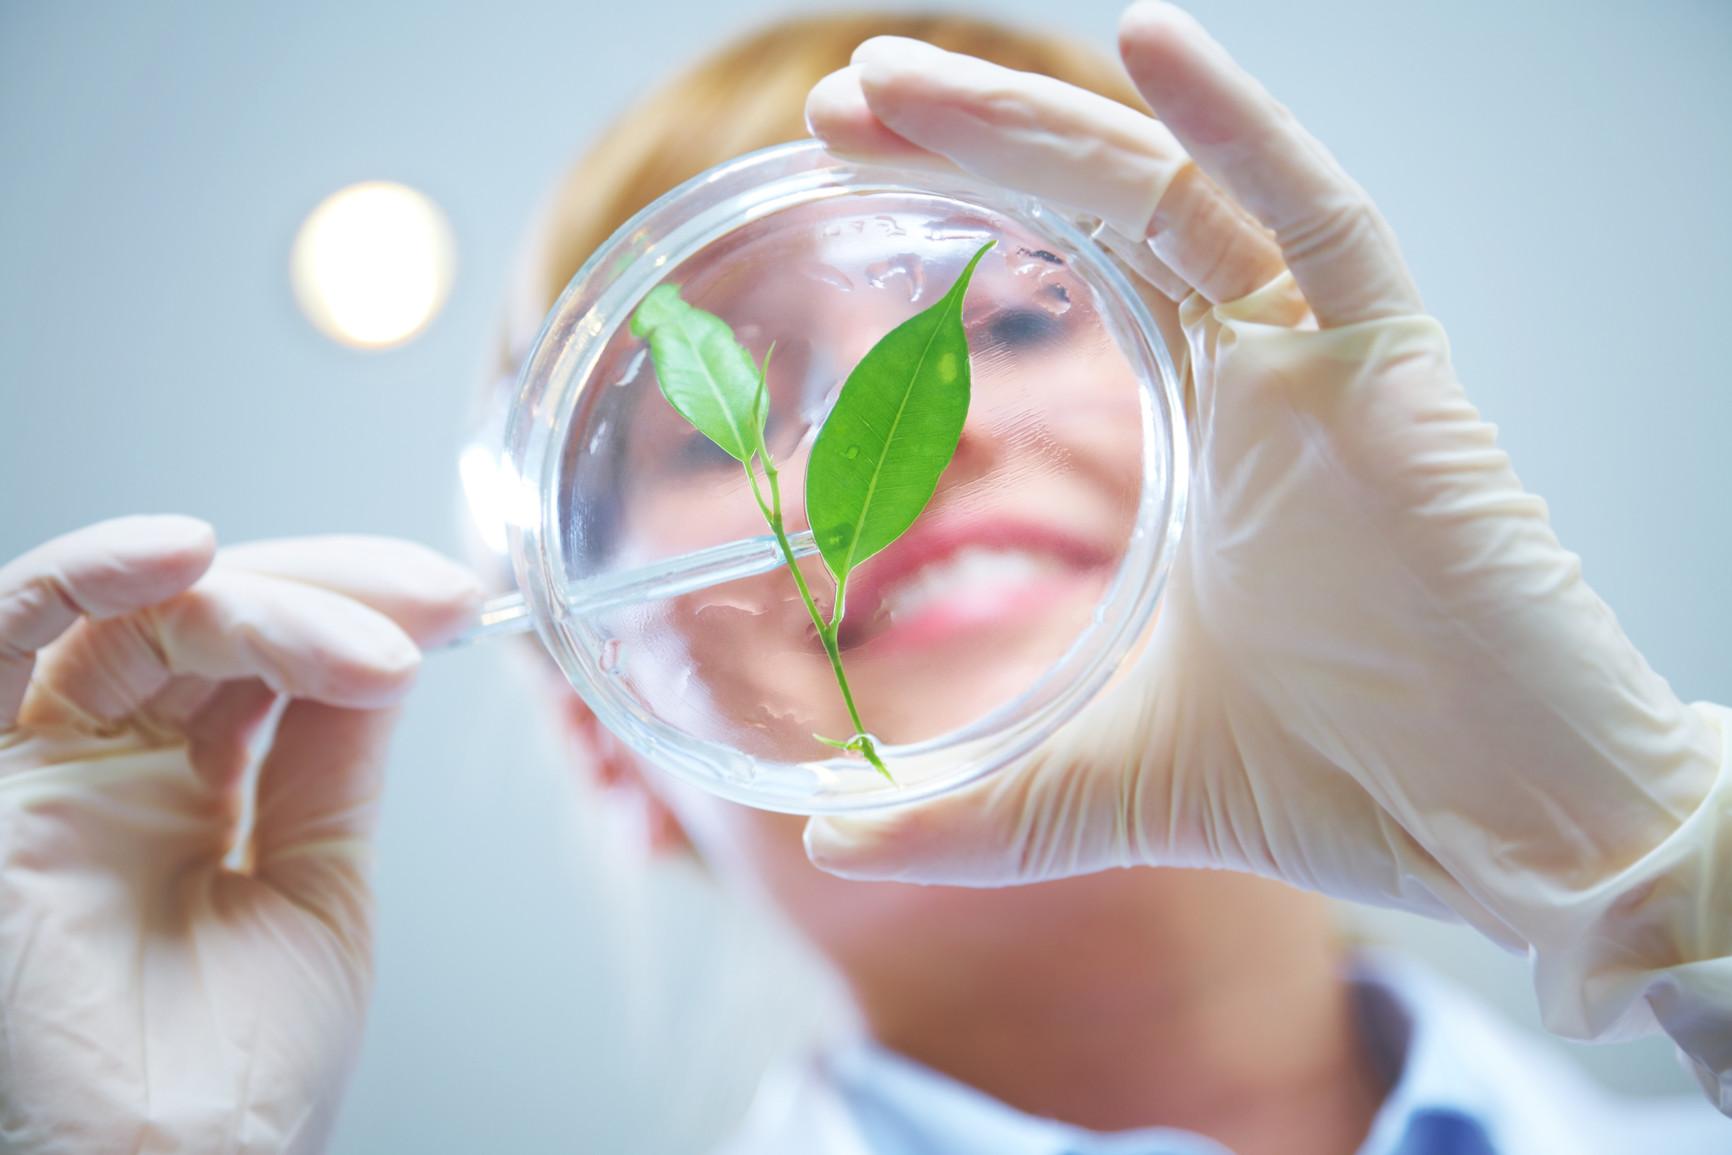 Sharps_Solutions_Medical_Waste_Management_California_Biohazard_Biotech_Life_Sciences_Waste_Disposal_Osha_Compliance_SanMateo_SanFrancisco_ Alameda_Sacramento_SantaCruz_DelNorte_LosAngeles_NoContacts